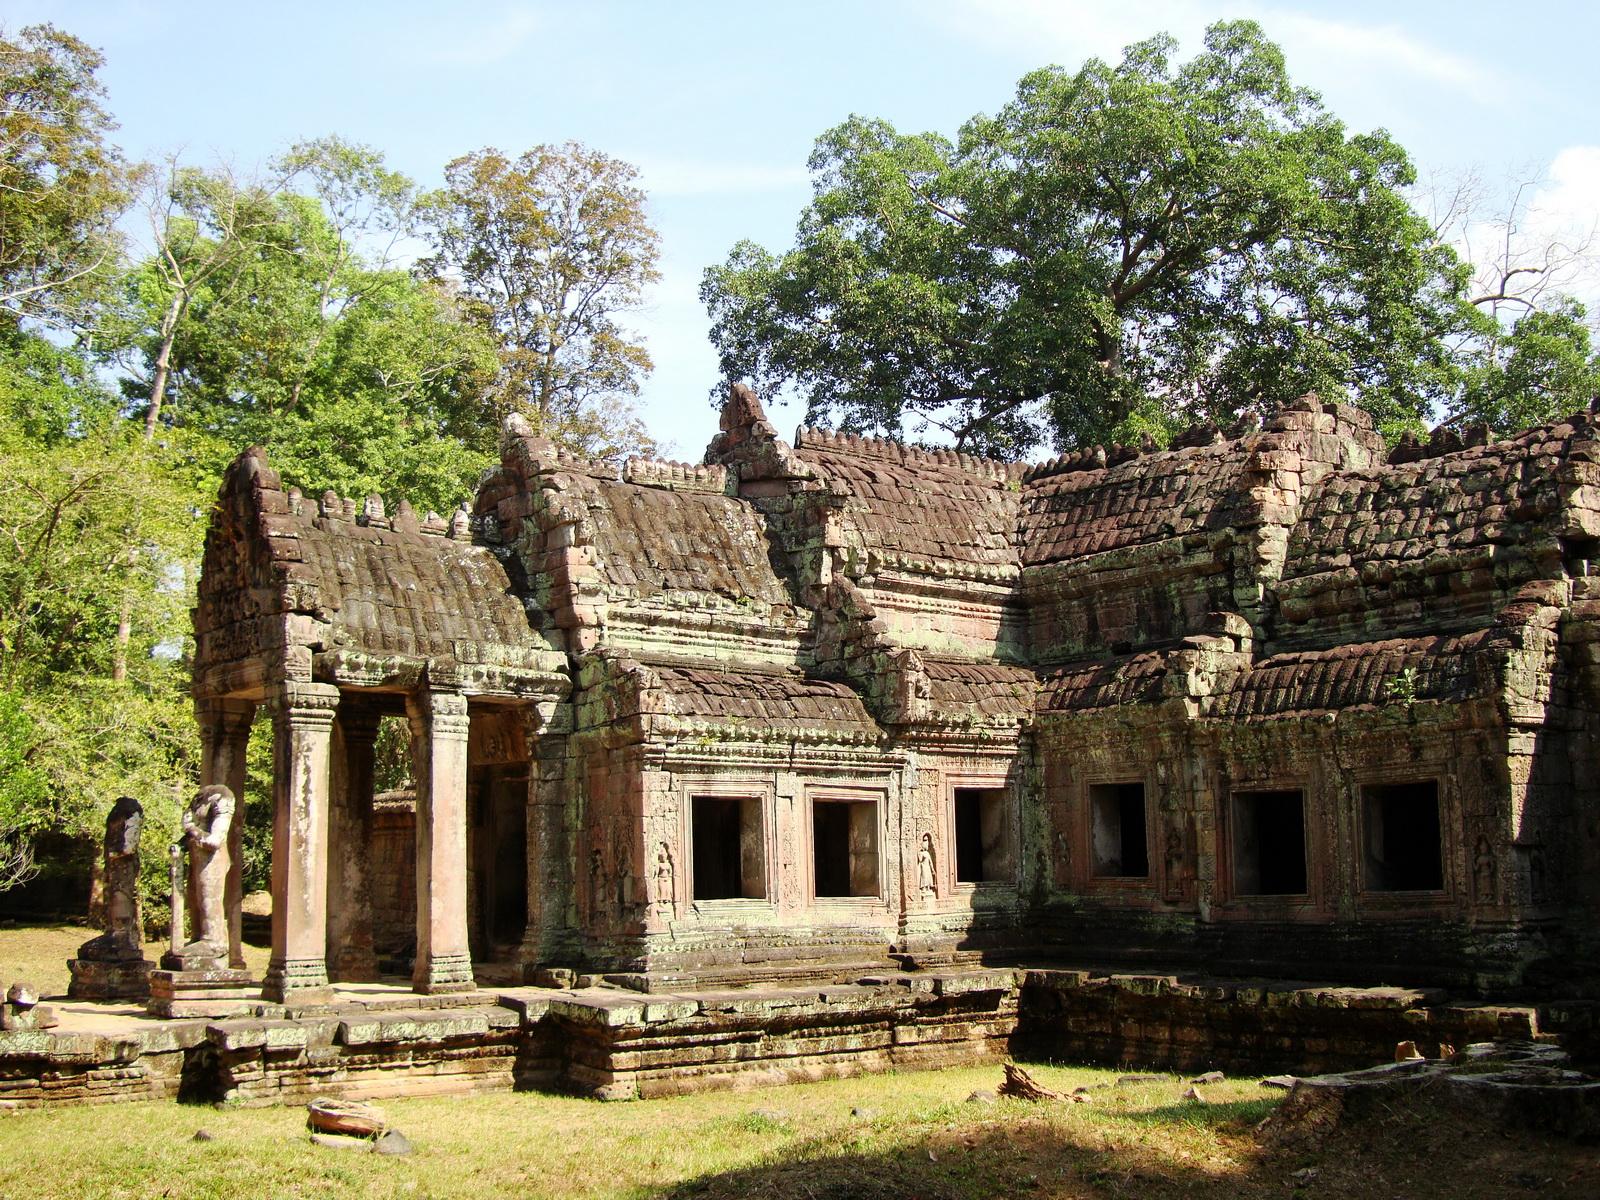 Preah Khan West entrance gopura headless guardians Angkor Thom 07